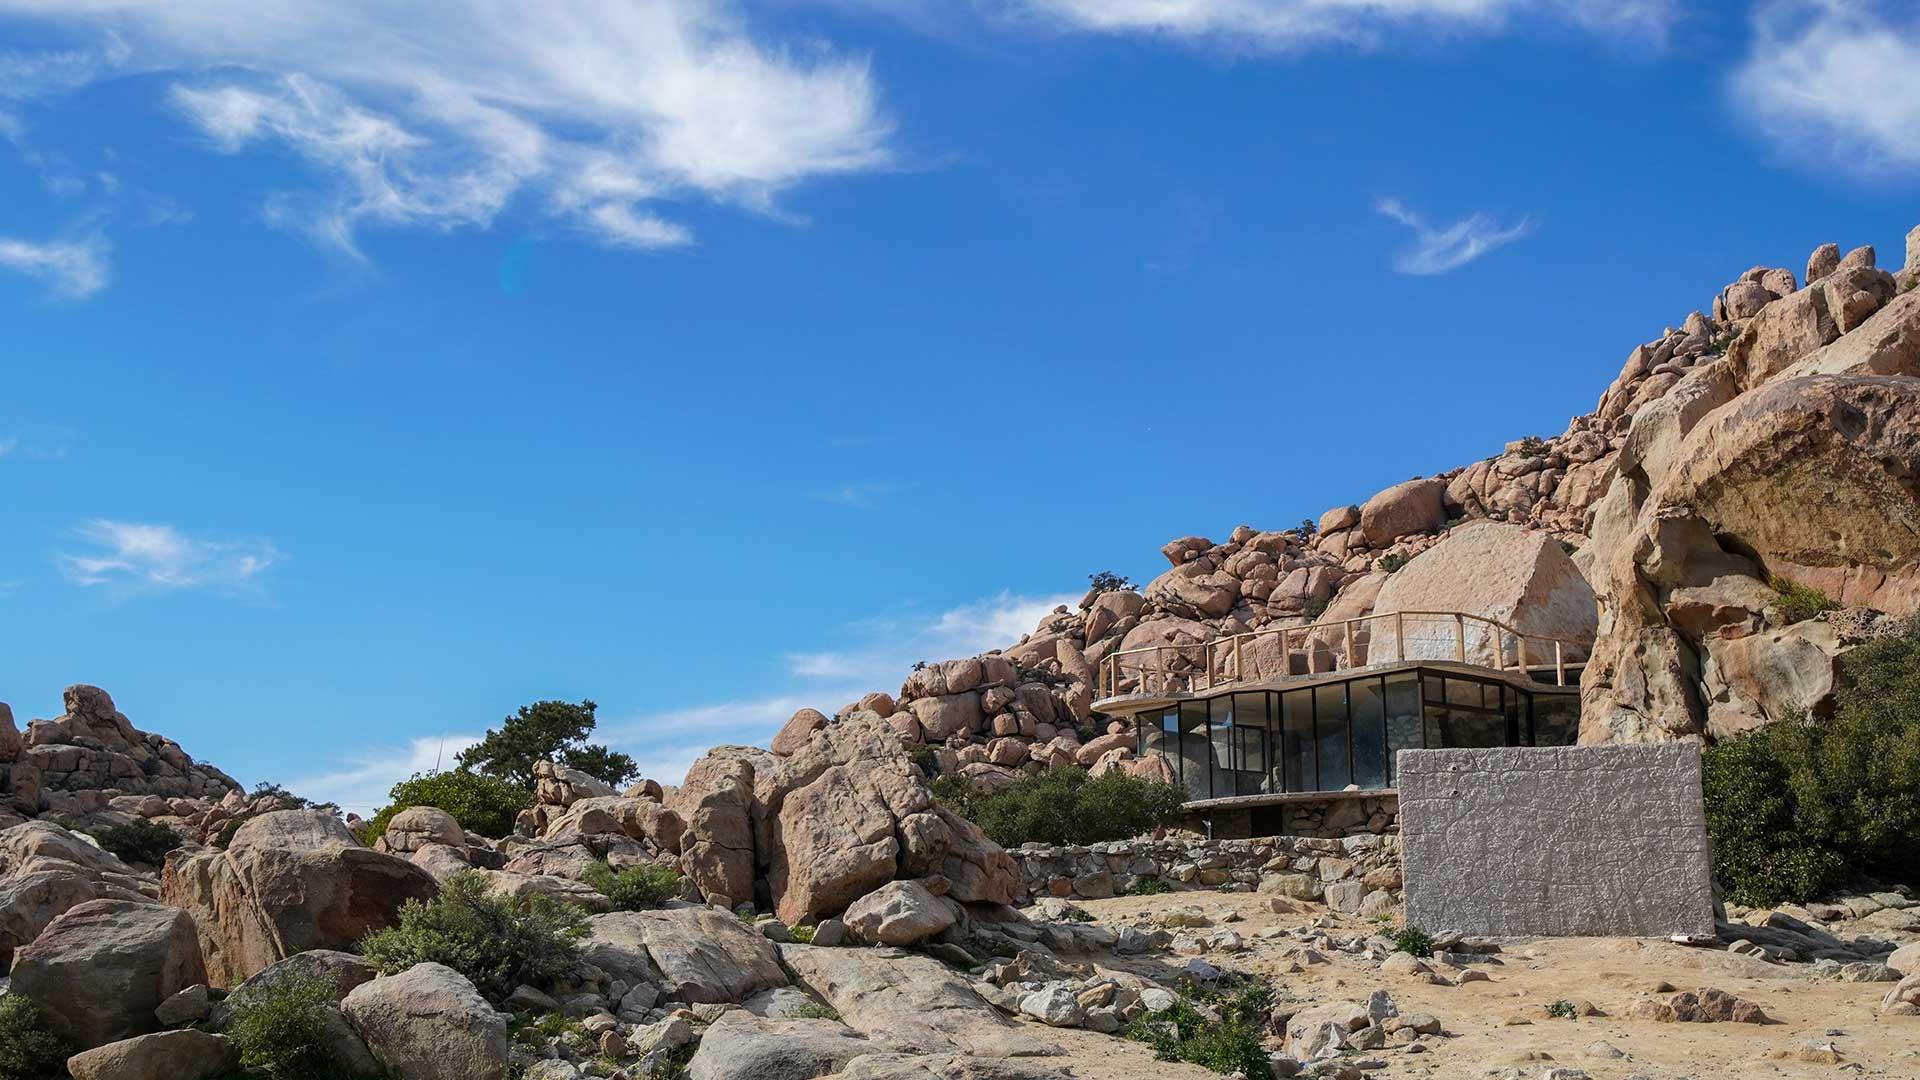 Baja California Rumorosa Casa de Piedra